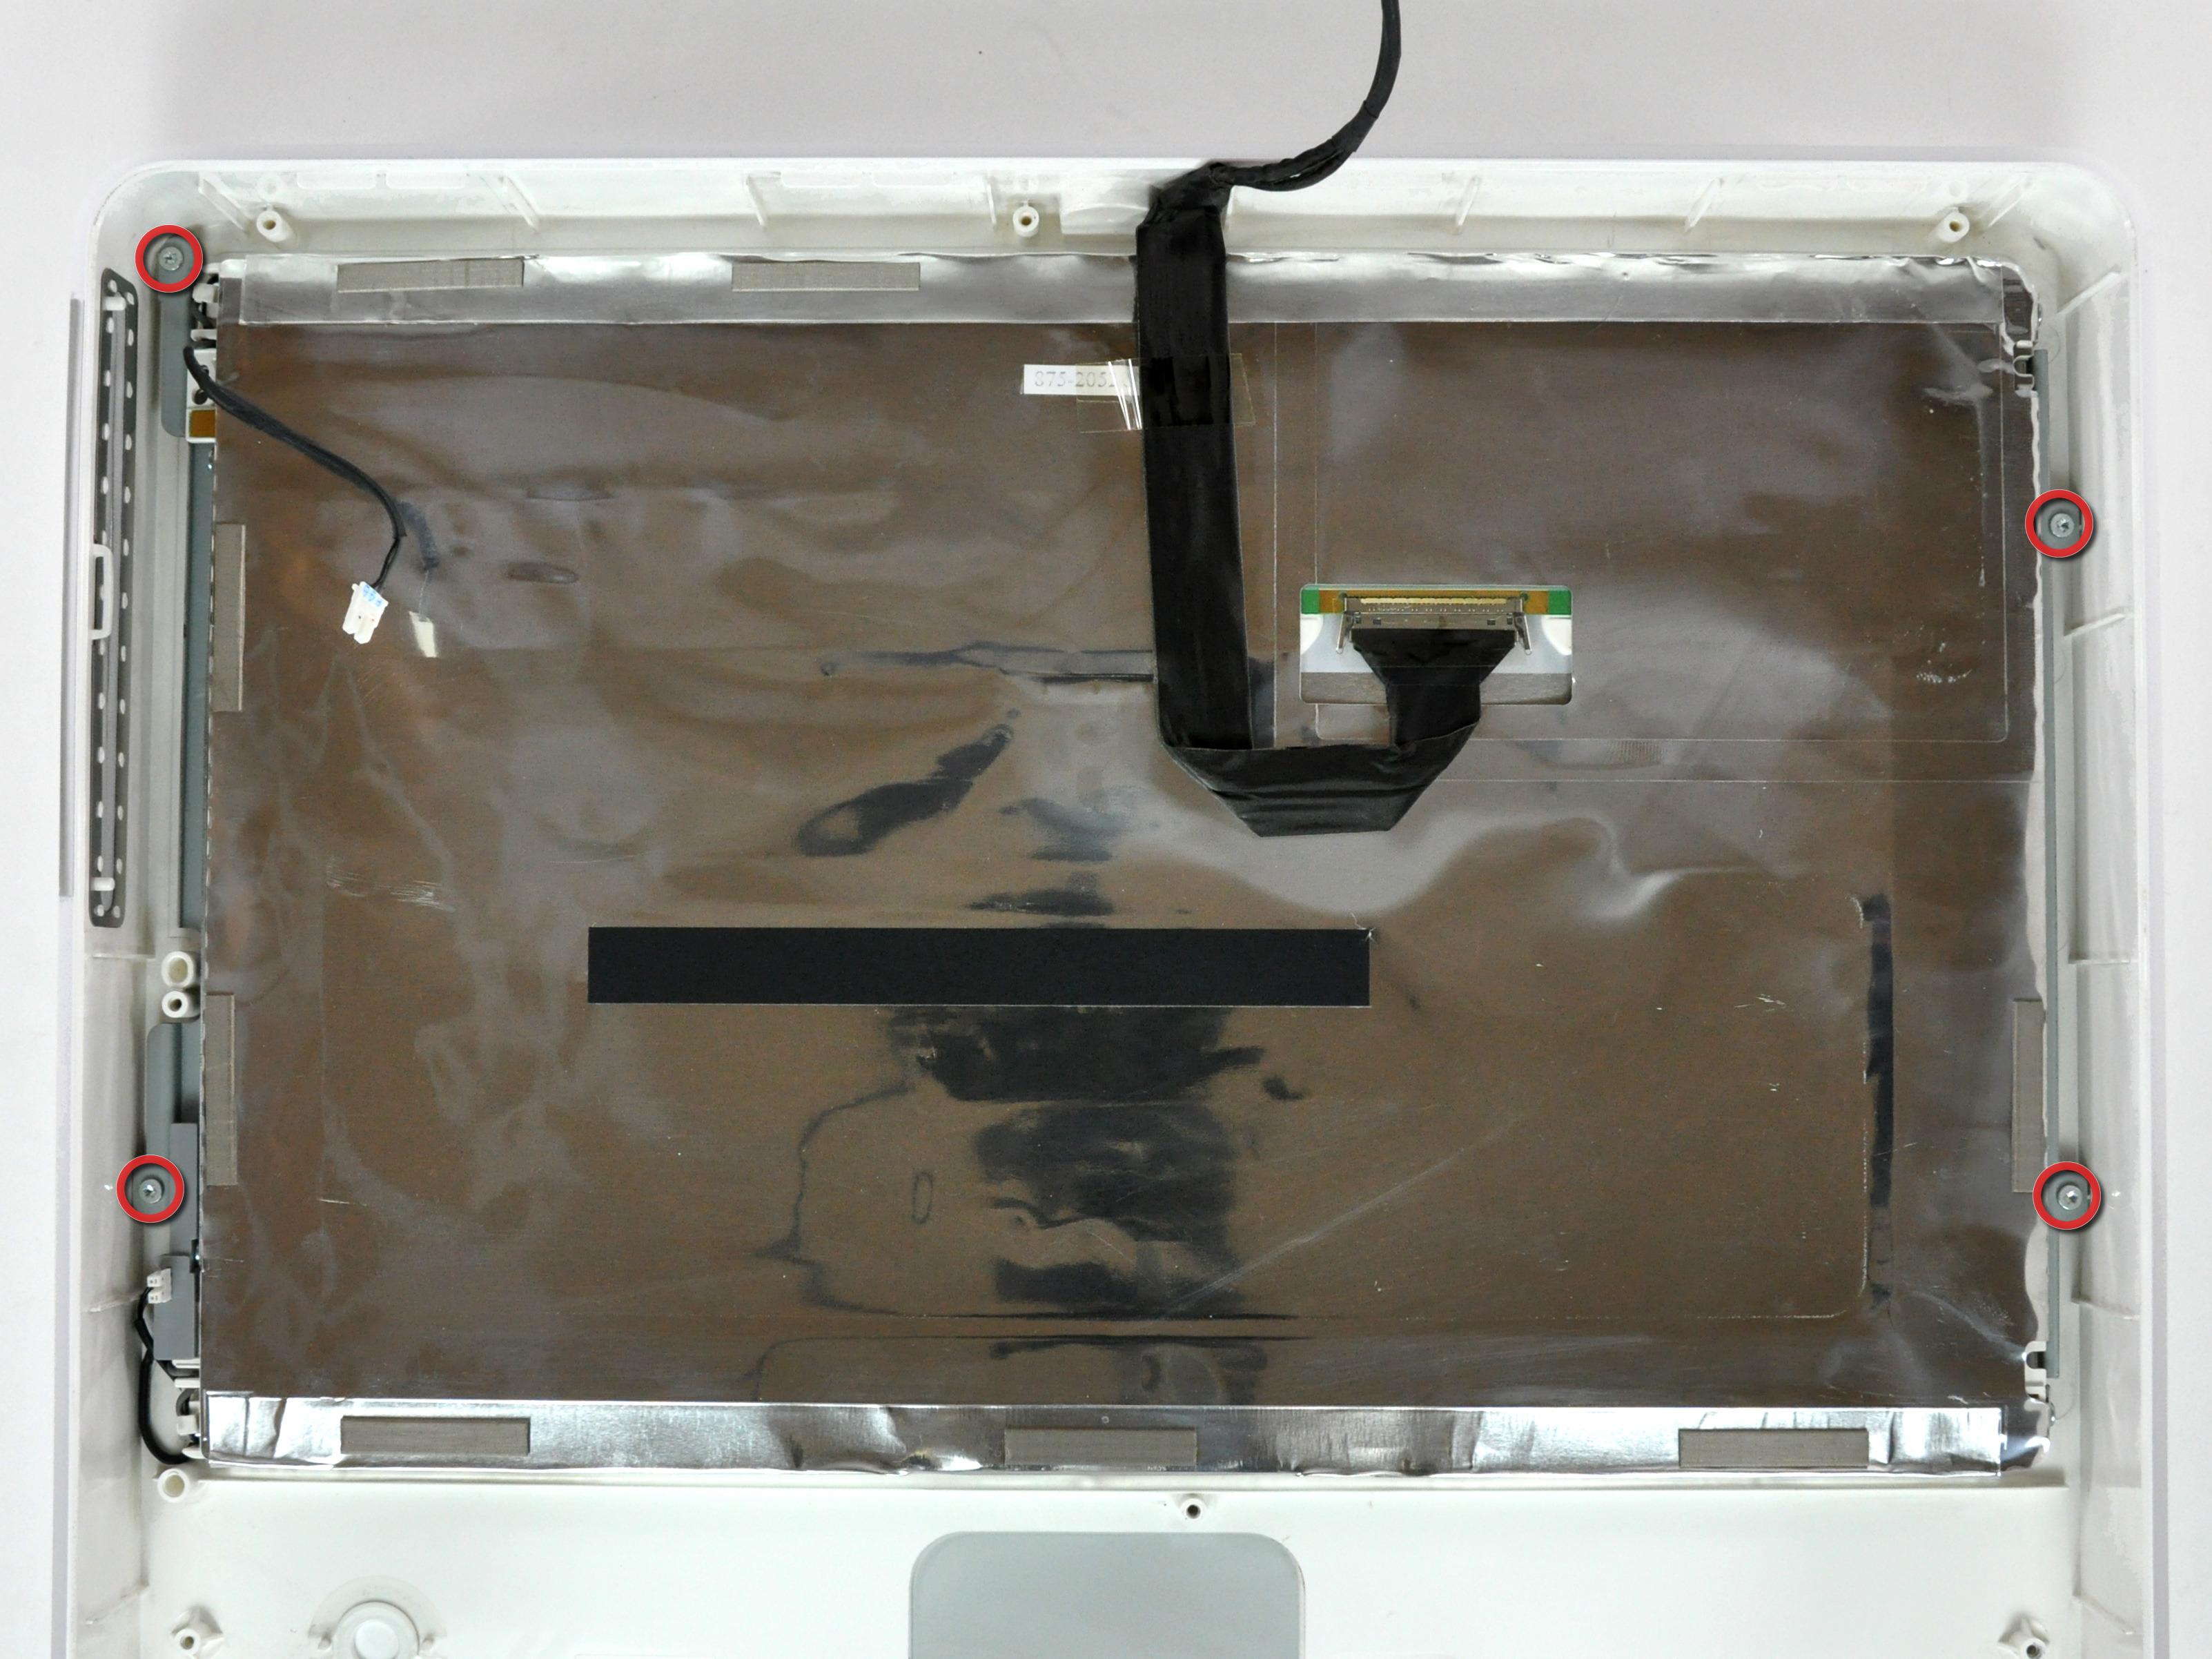 imac g5 17 model a1058 display replacement ifixit repair guide rh ifixit com iMac G1 iMac G6